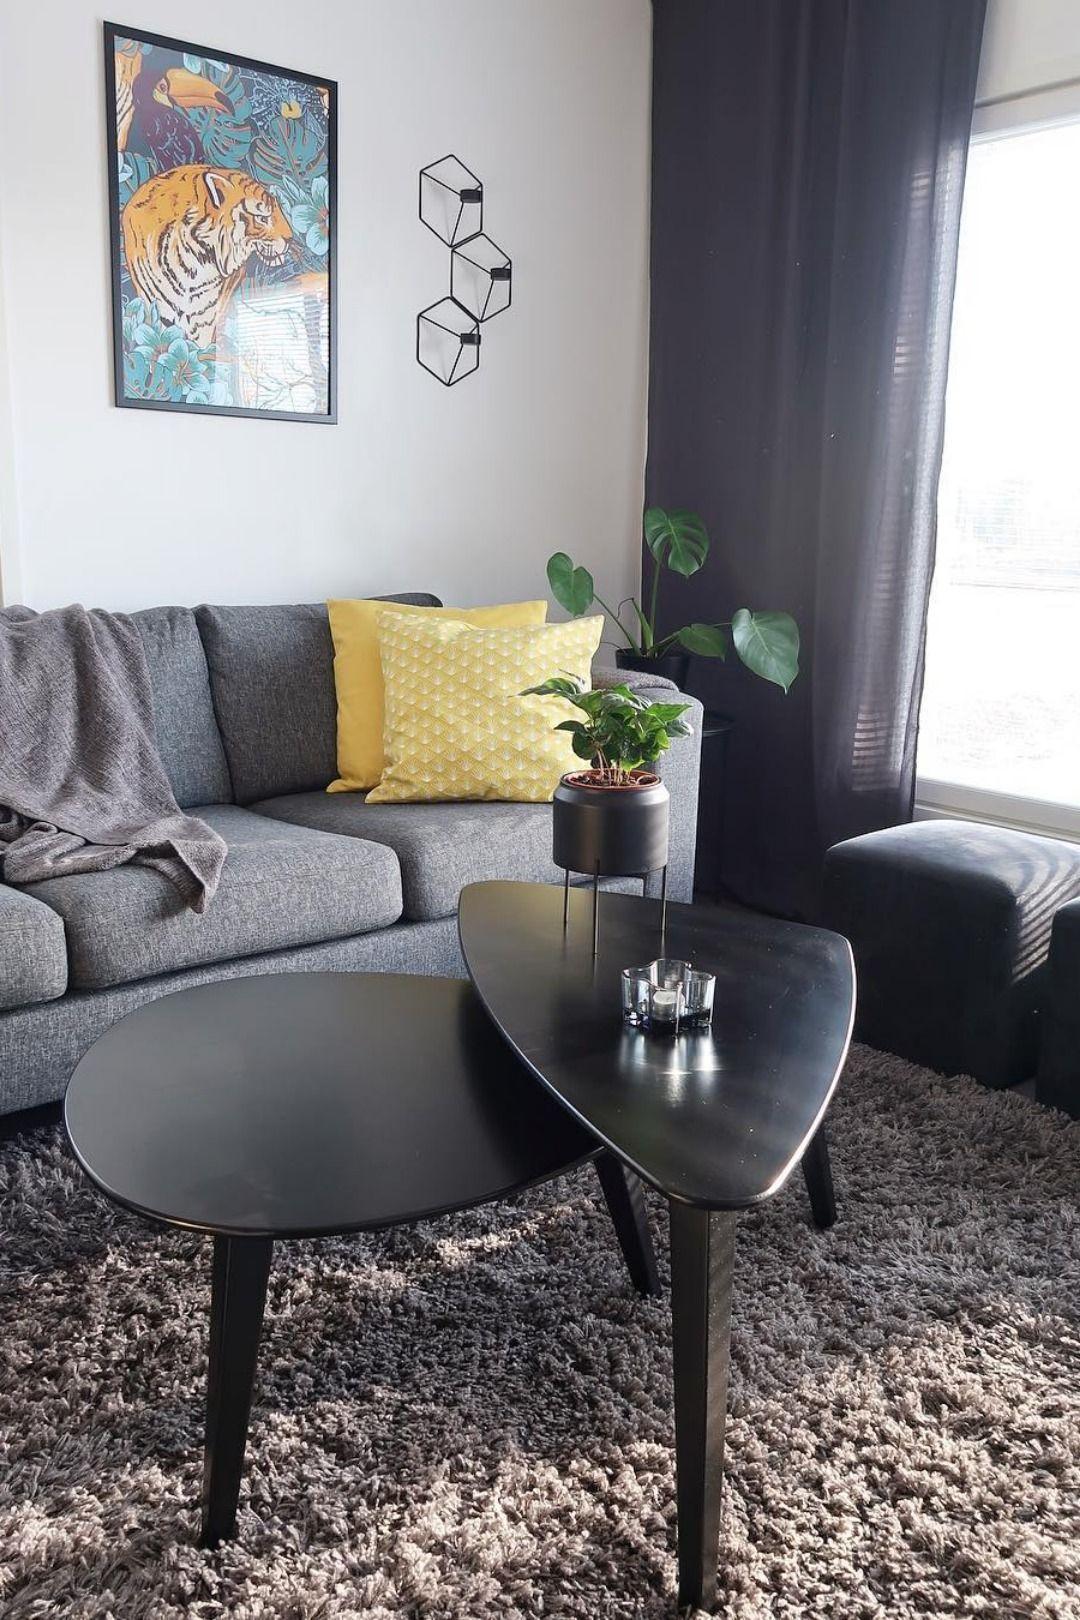 living room furniture arrangement ideas Home Decor Ideas